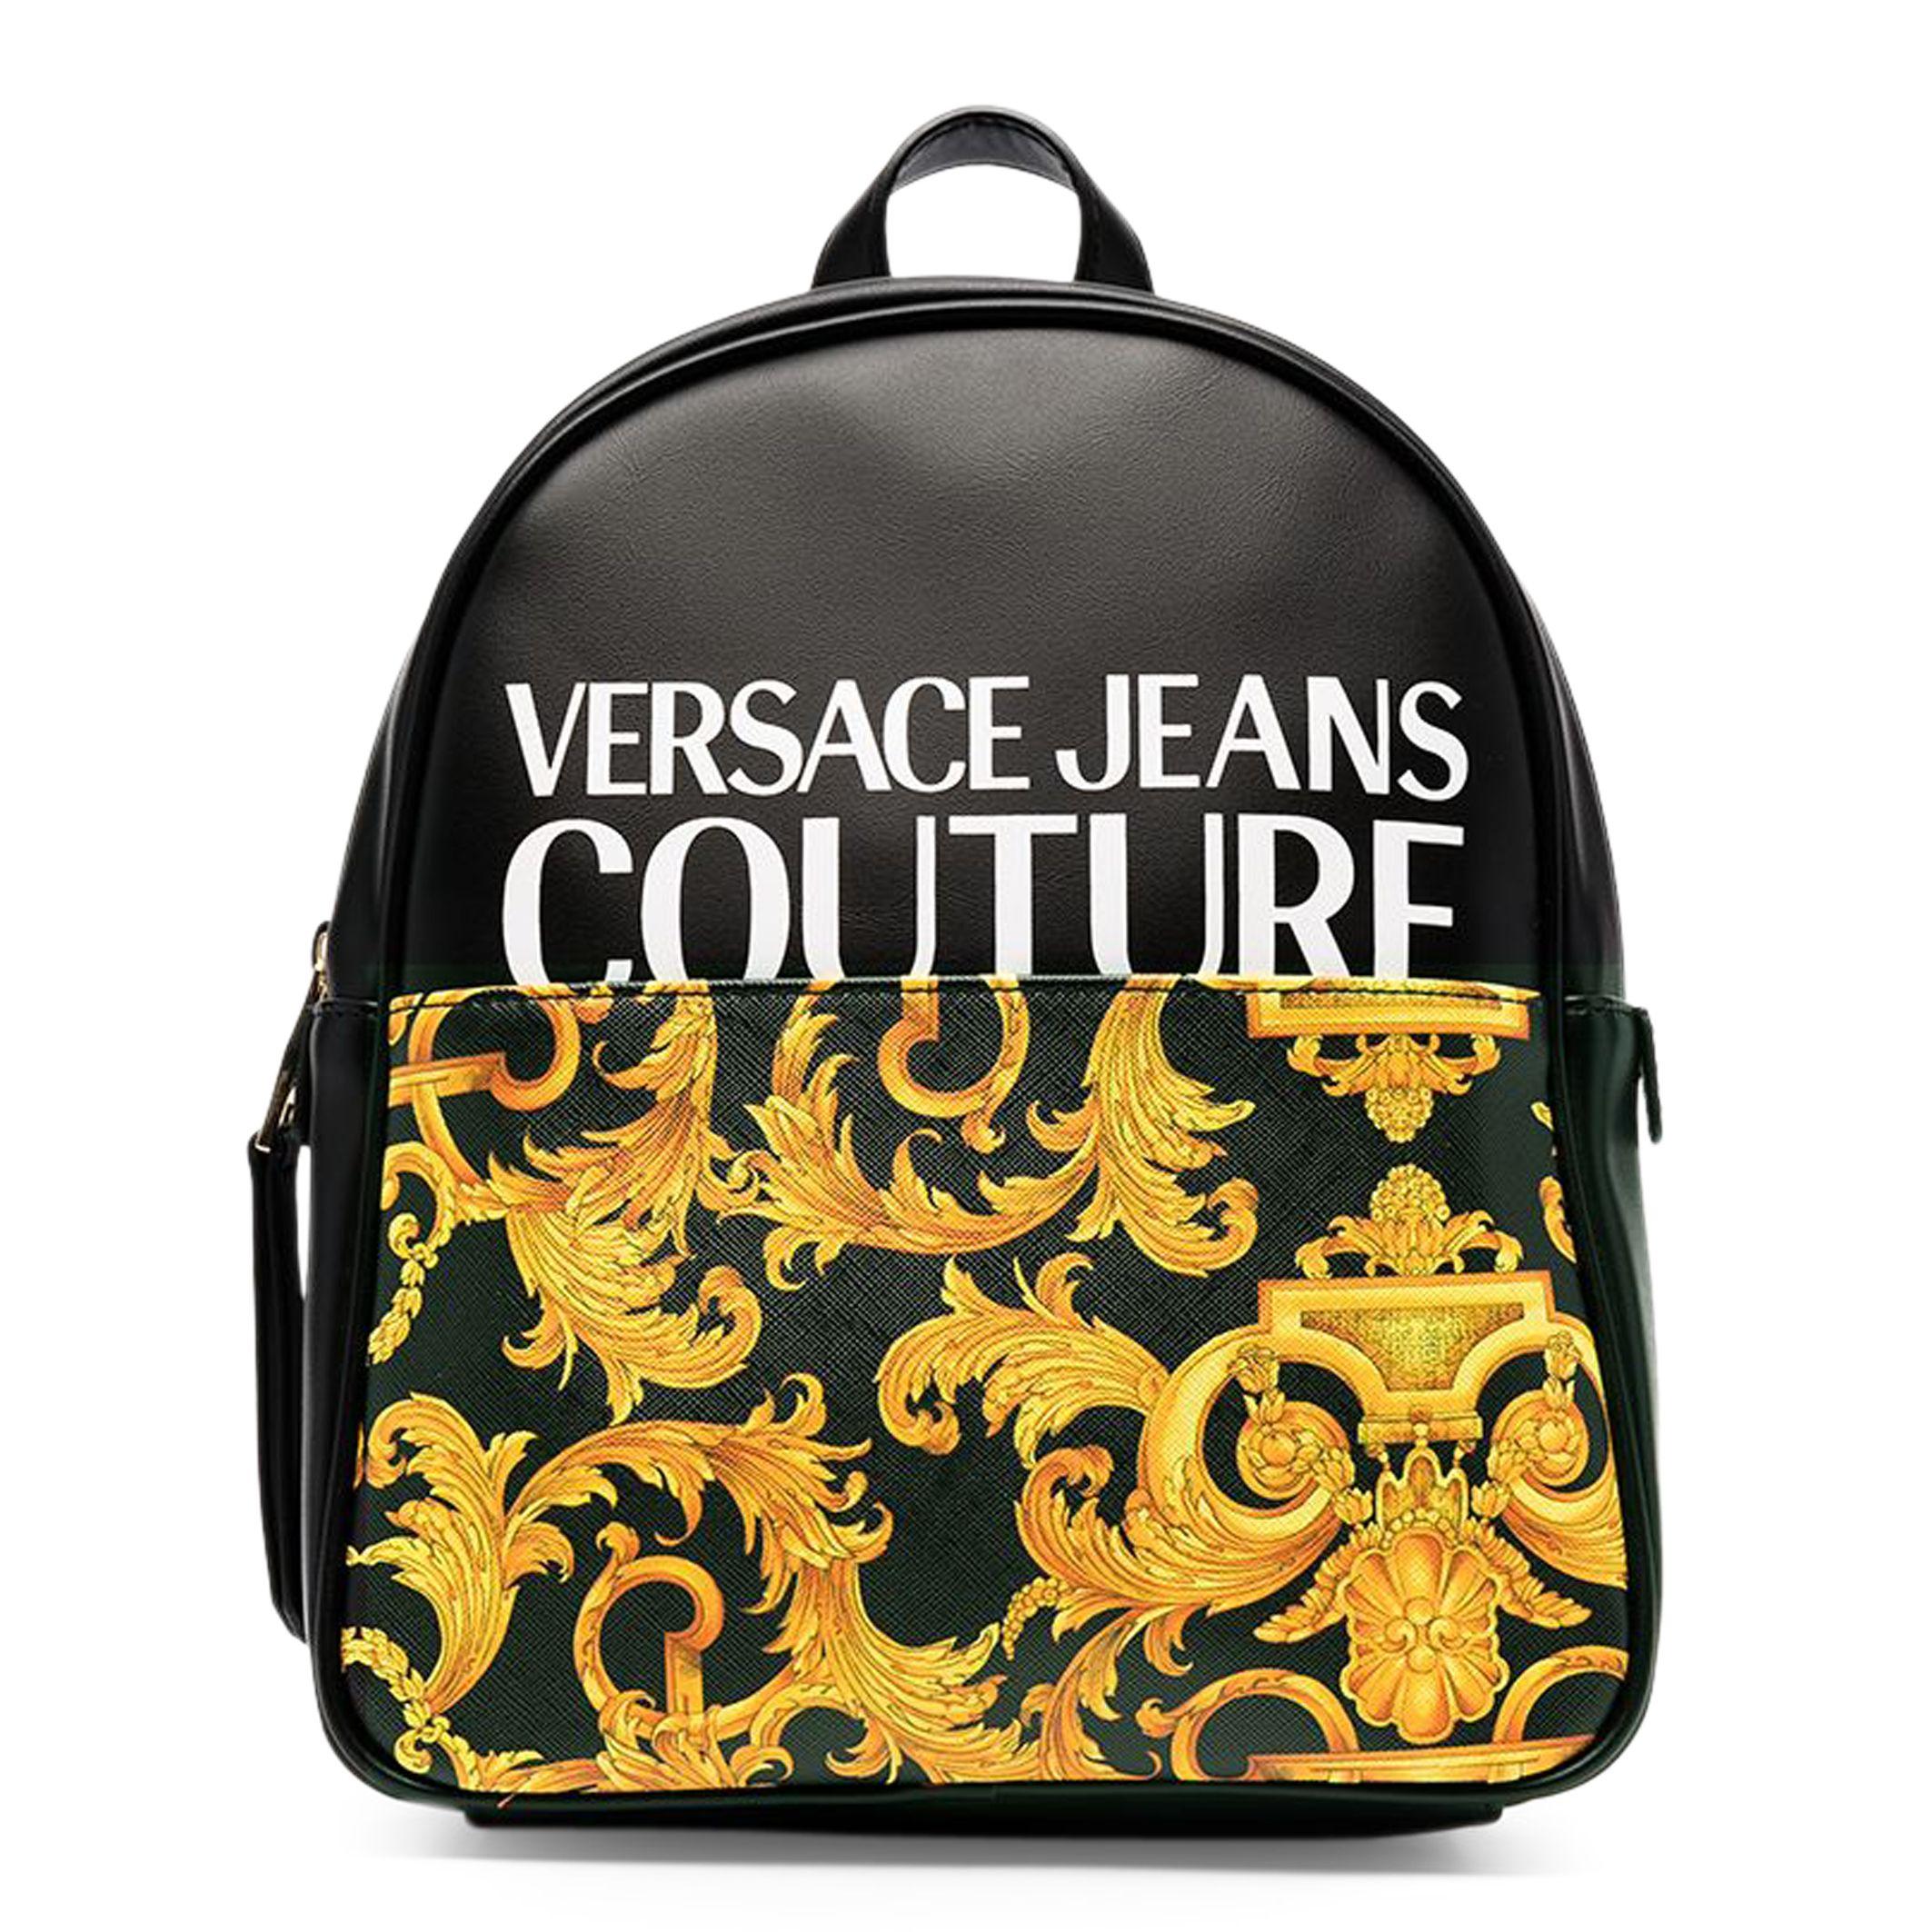 Versace Jeans – E1VWABG8_71727 – Zwart Designeritems.nl